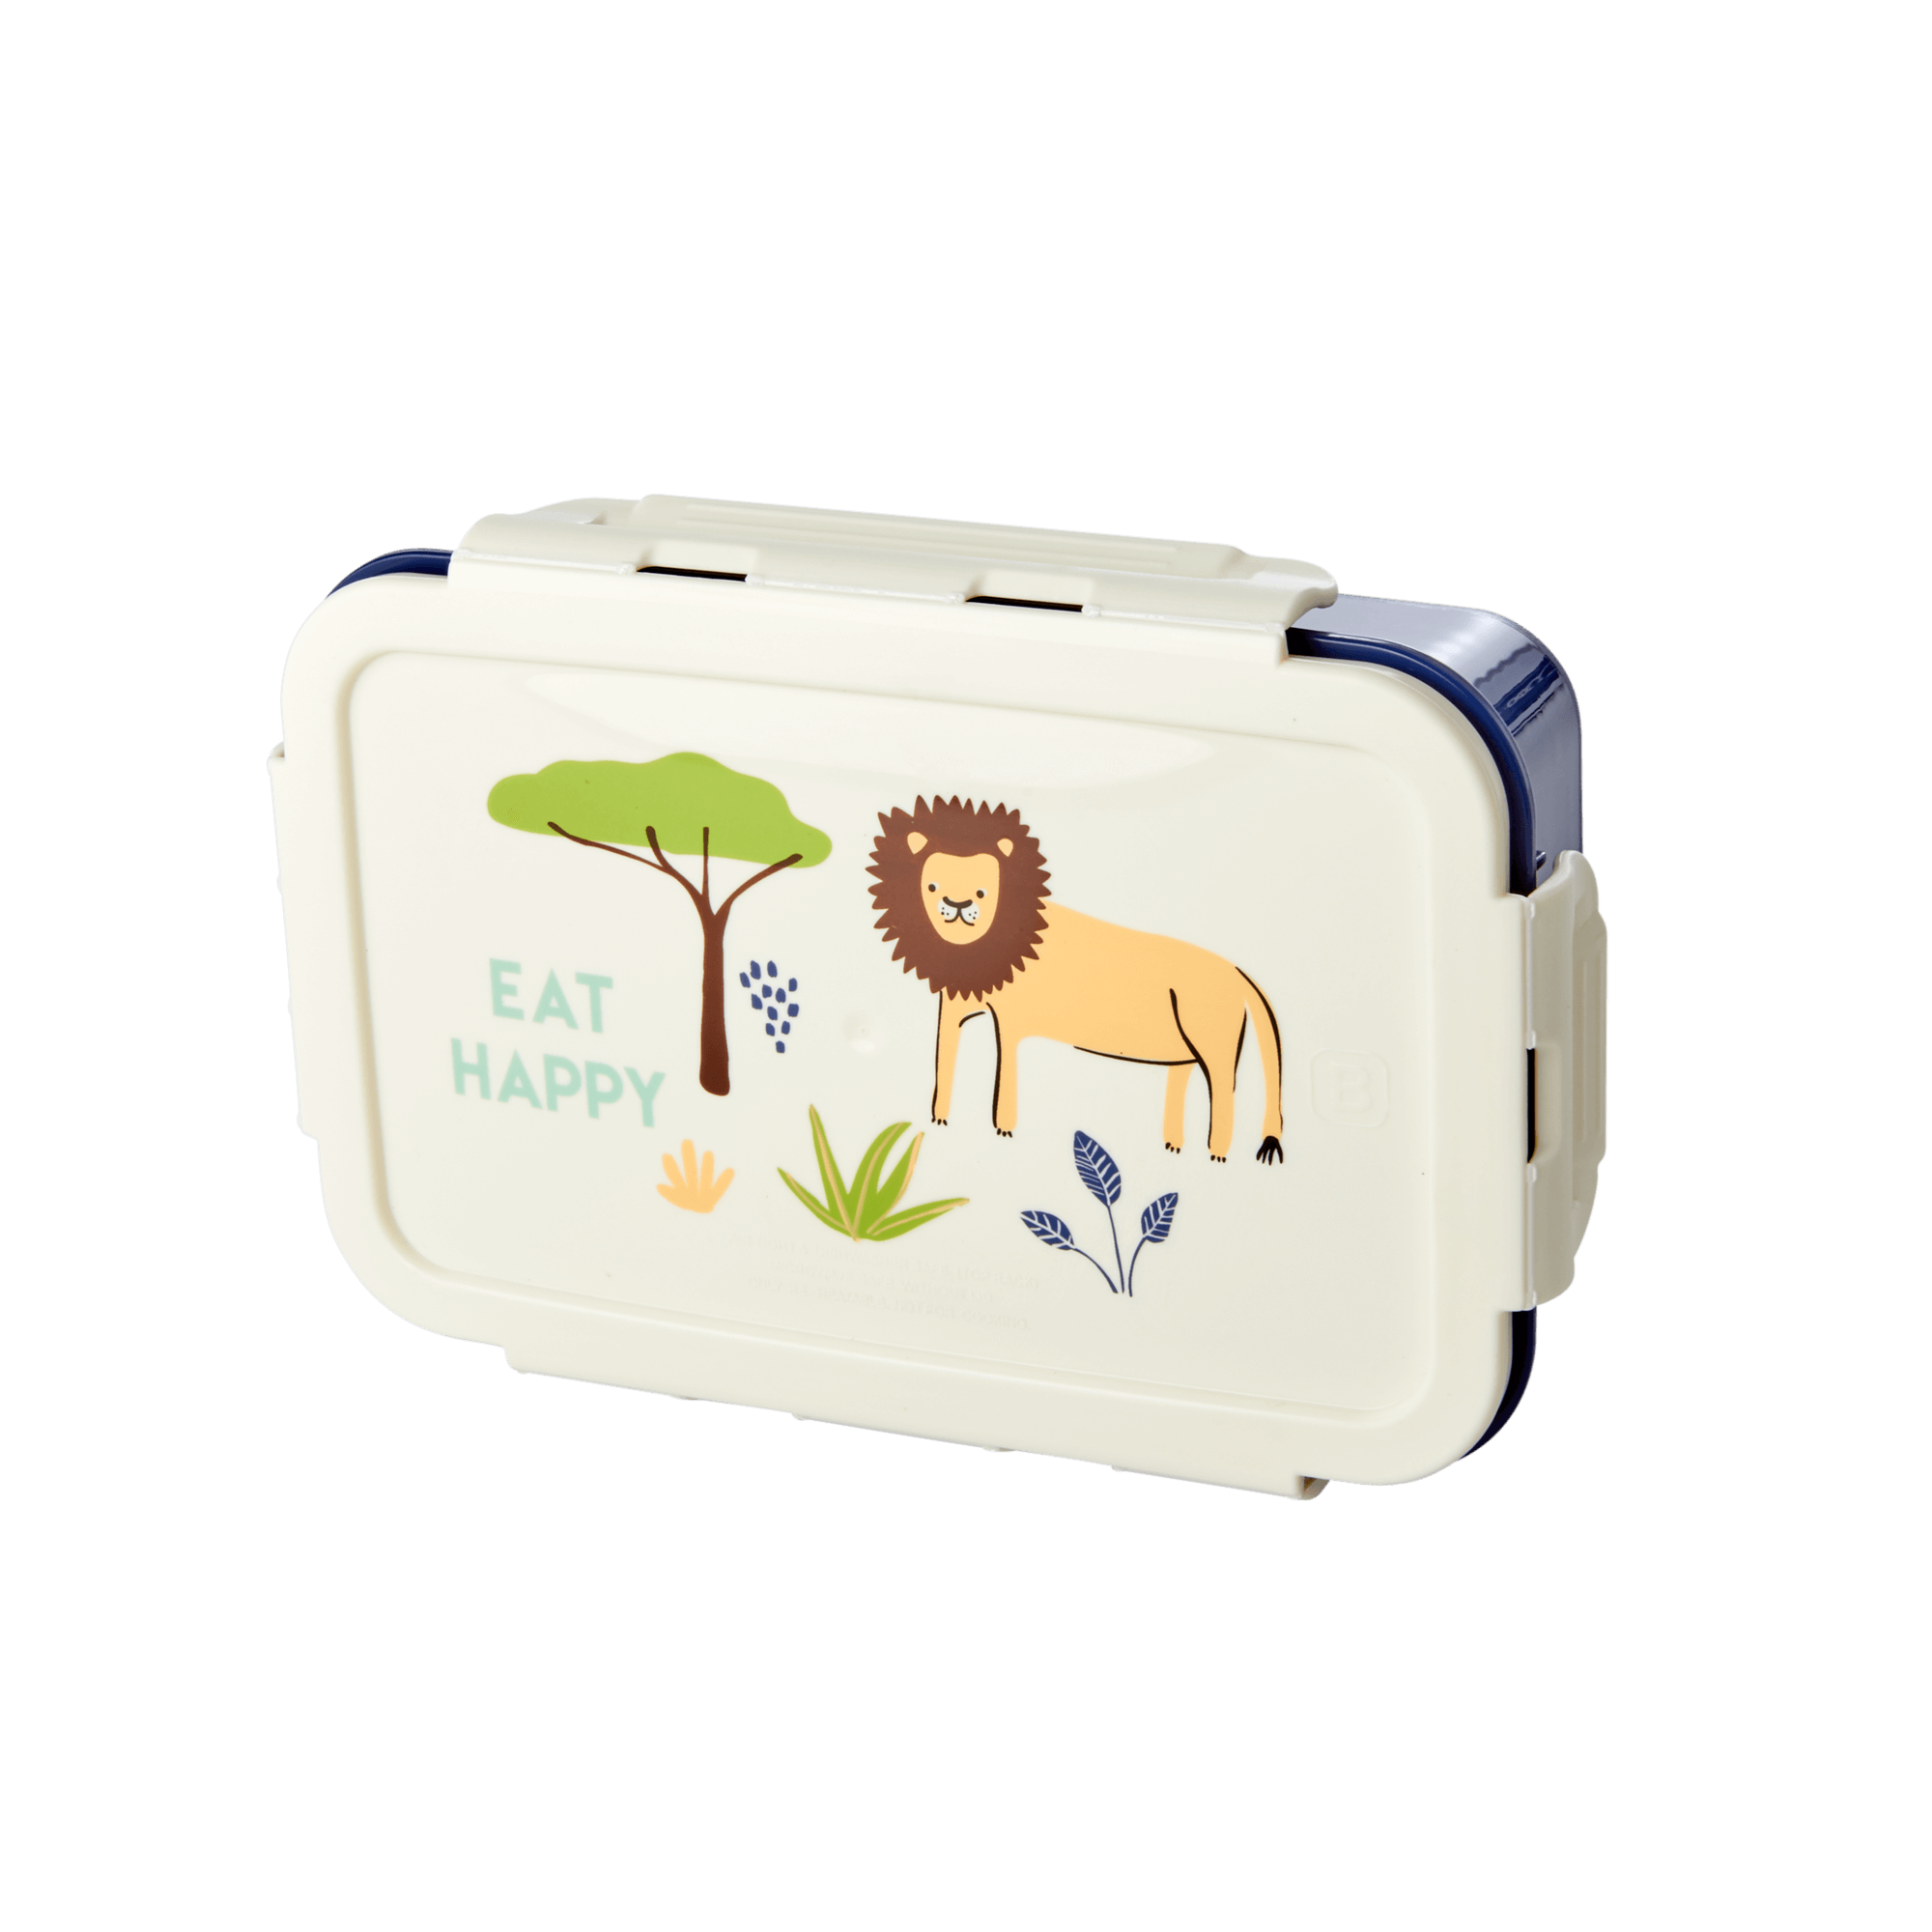 Rice - Lunchbox w. 3 Inserts - Blue Jungle Print